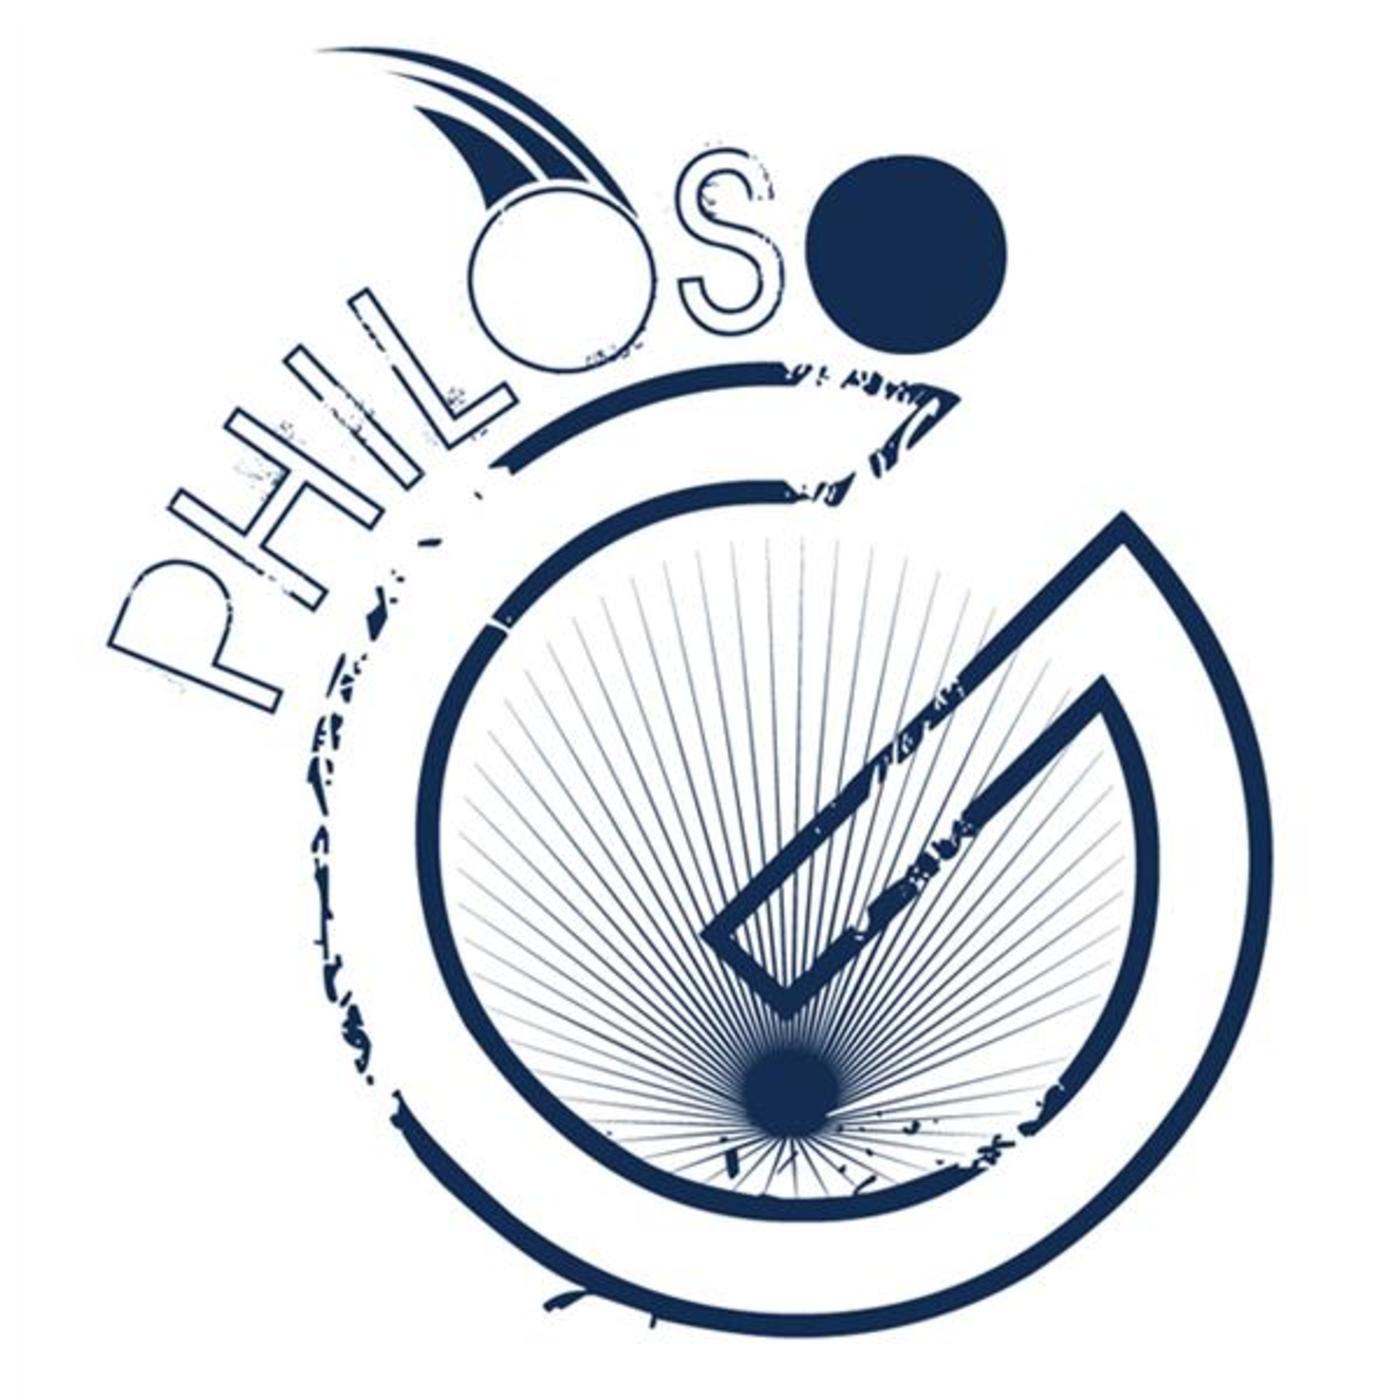 philosog1